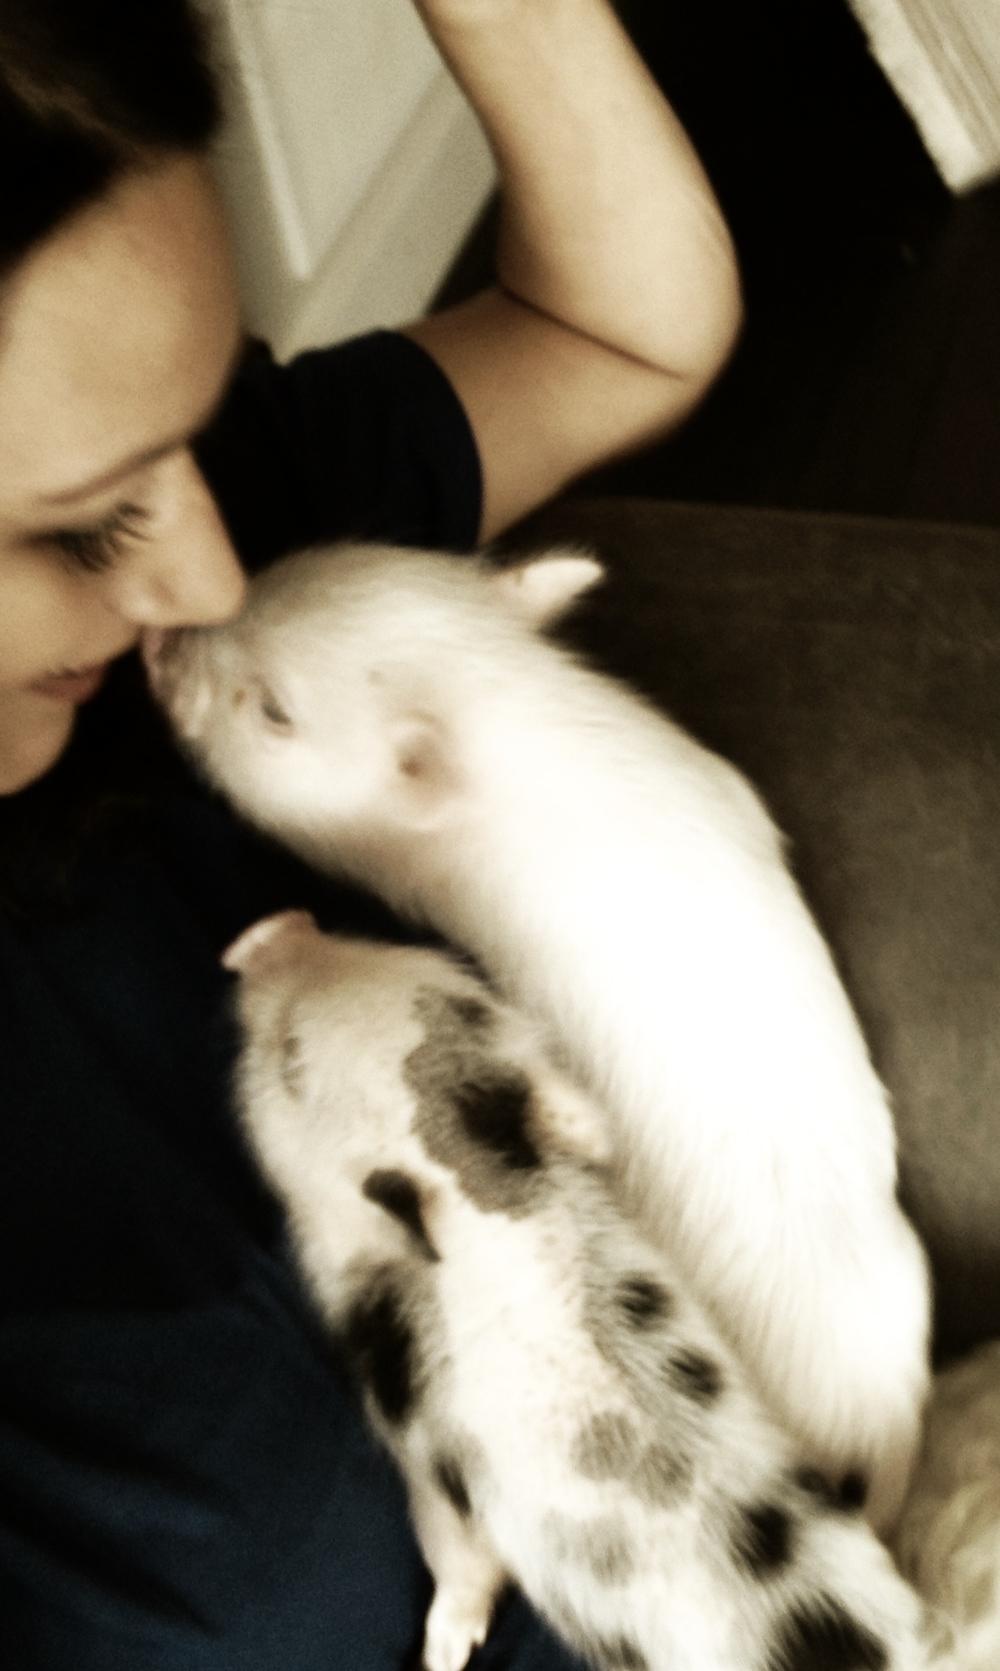 mini-pet-pigs-cuddle.jpg